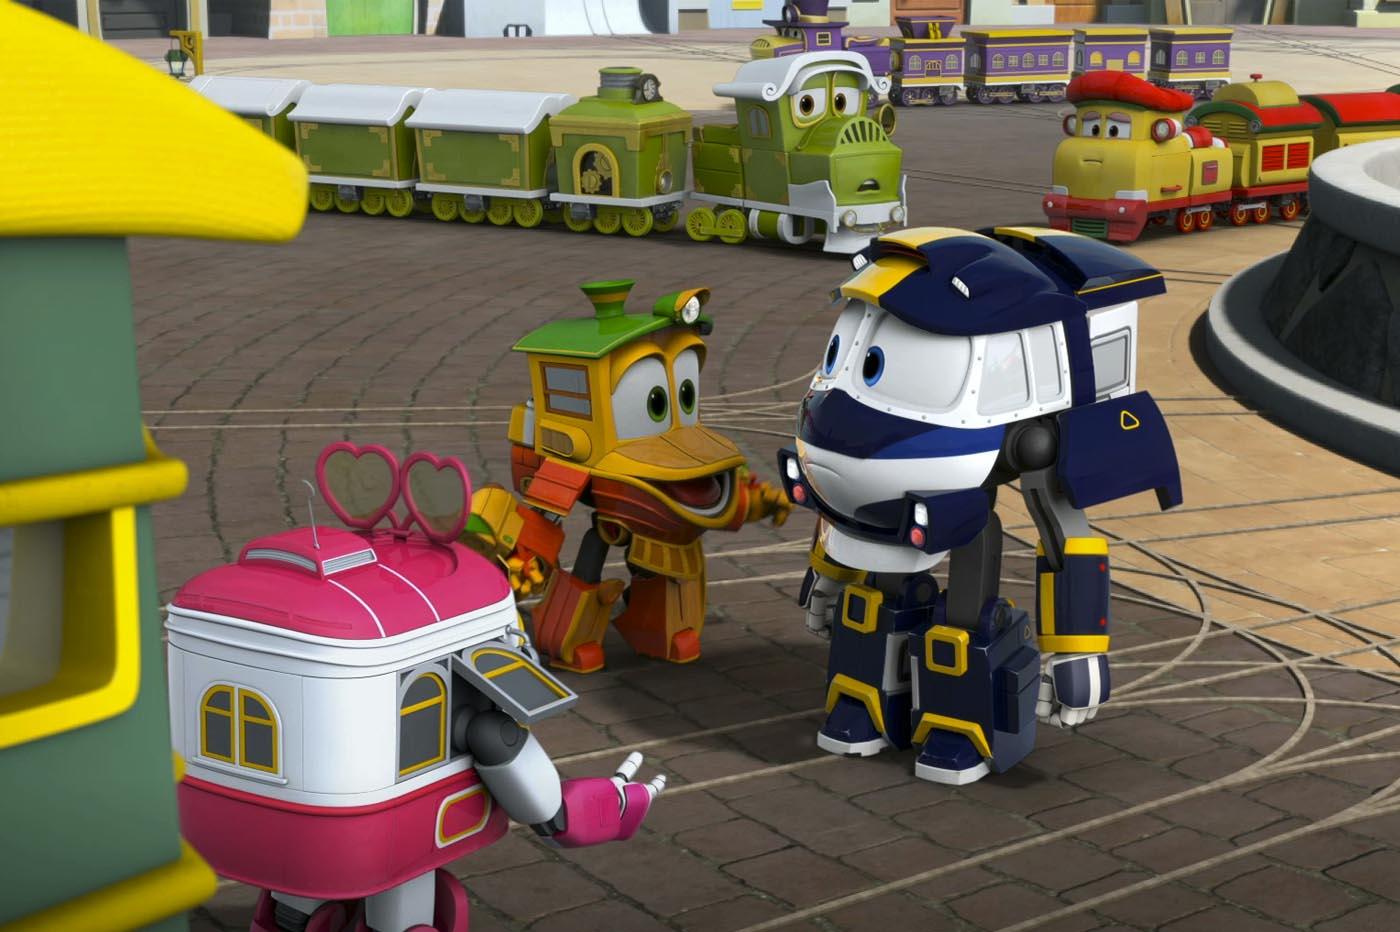 Critica Robot trains